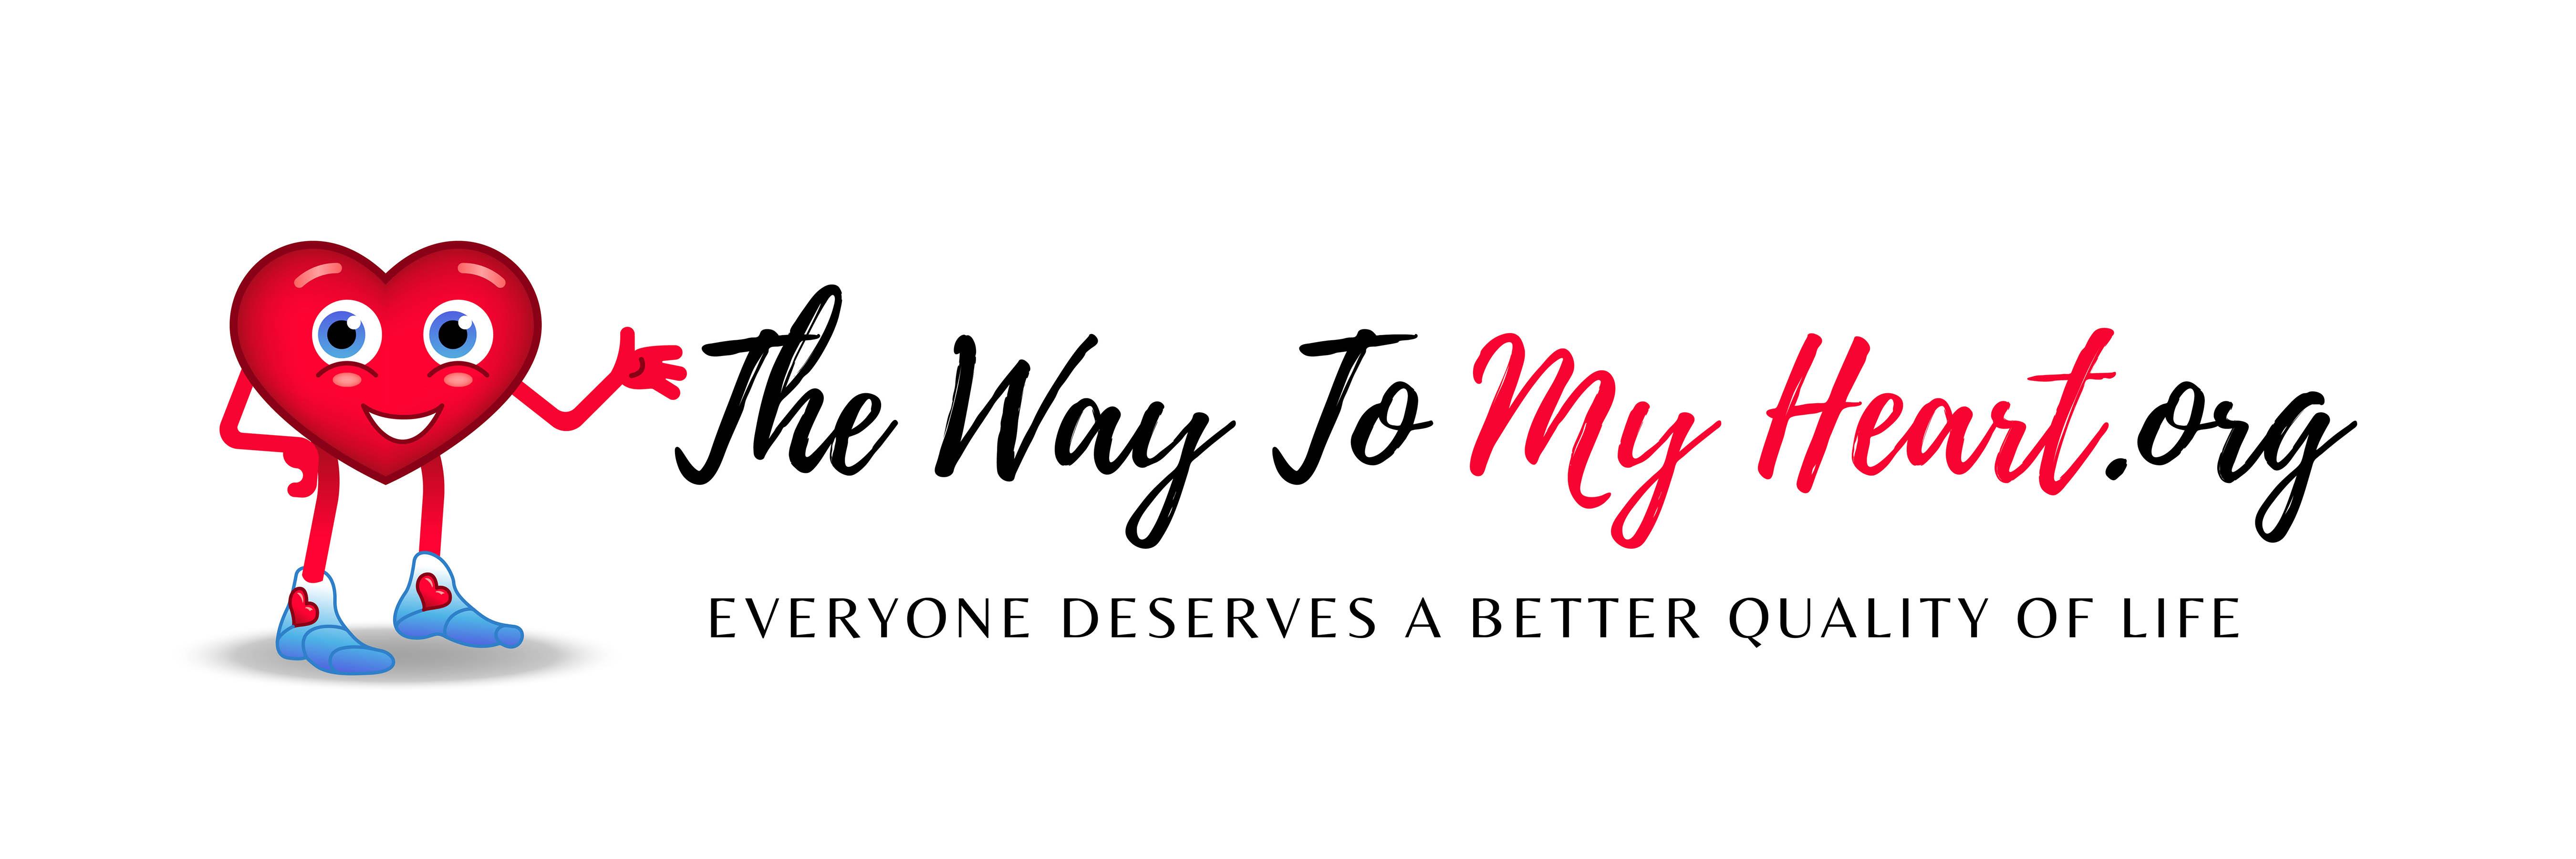 The Way to My Heart logo